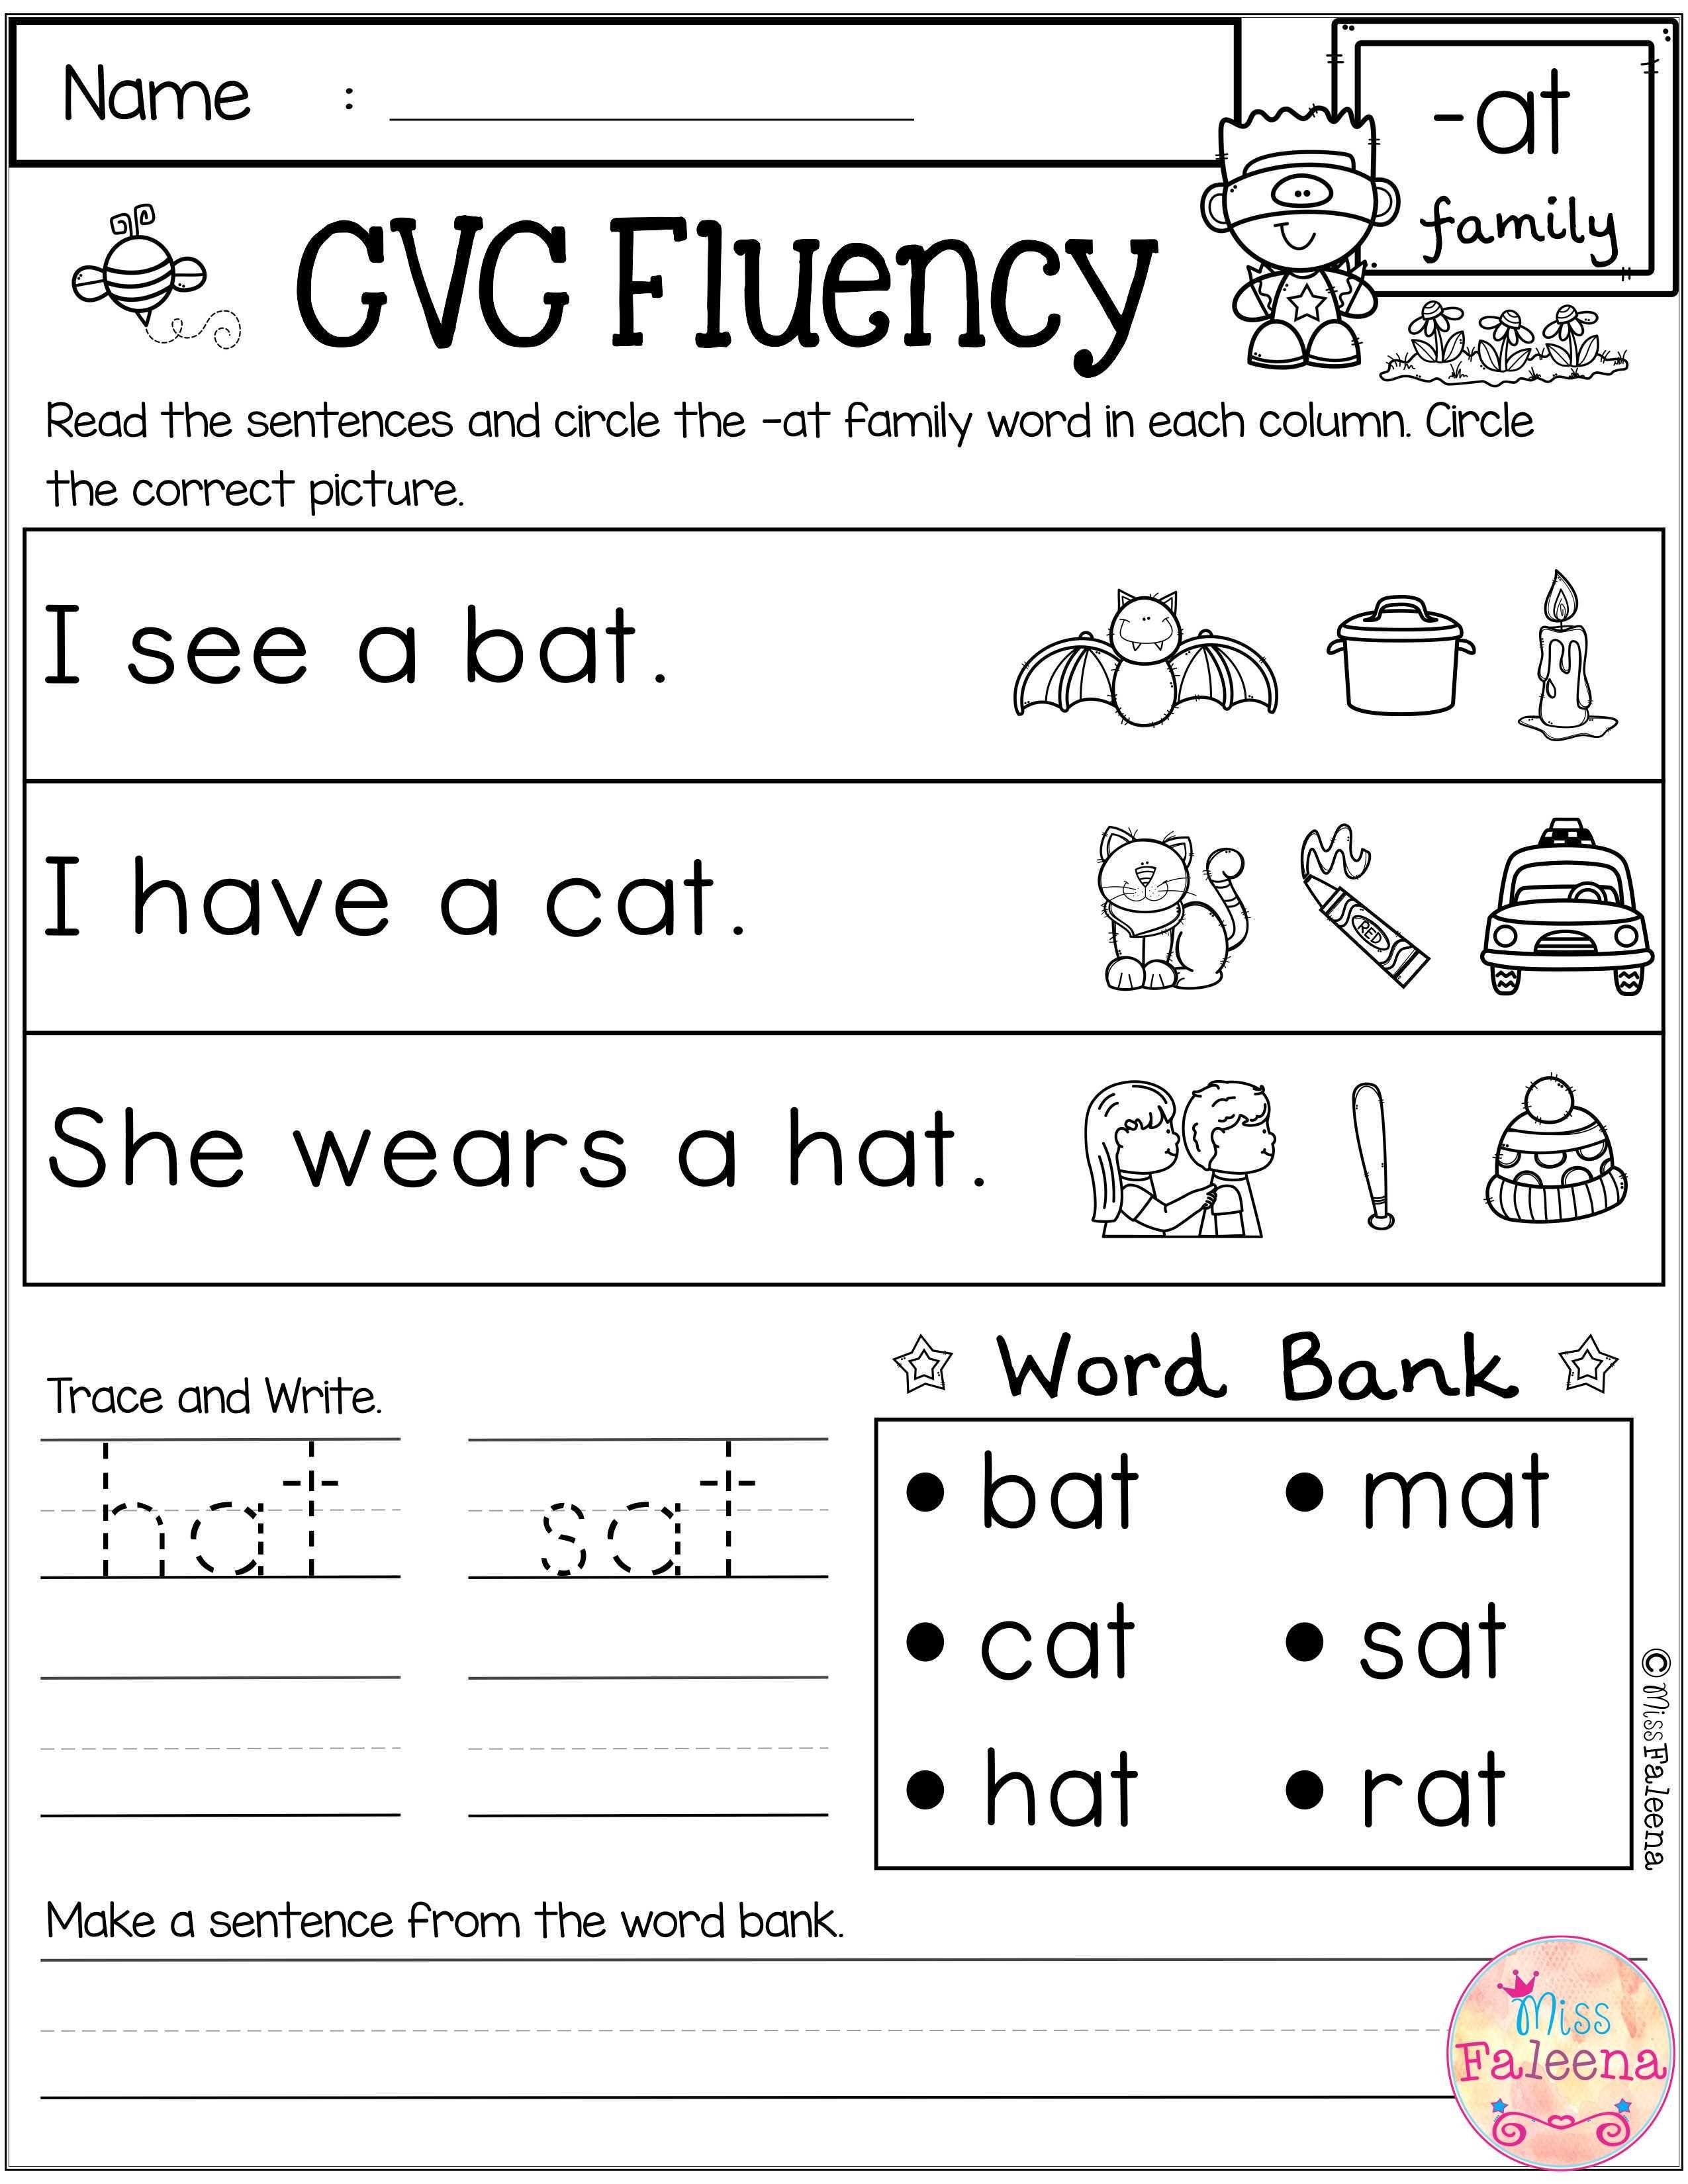 Free Cvc Fluency First Grade Worksheets Word Families Cvc Fluency